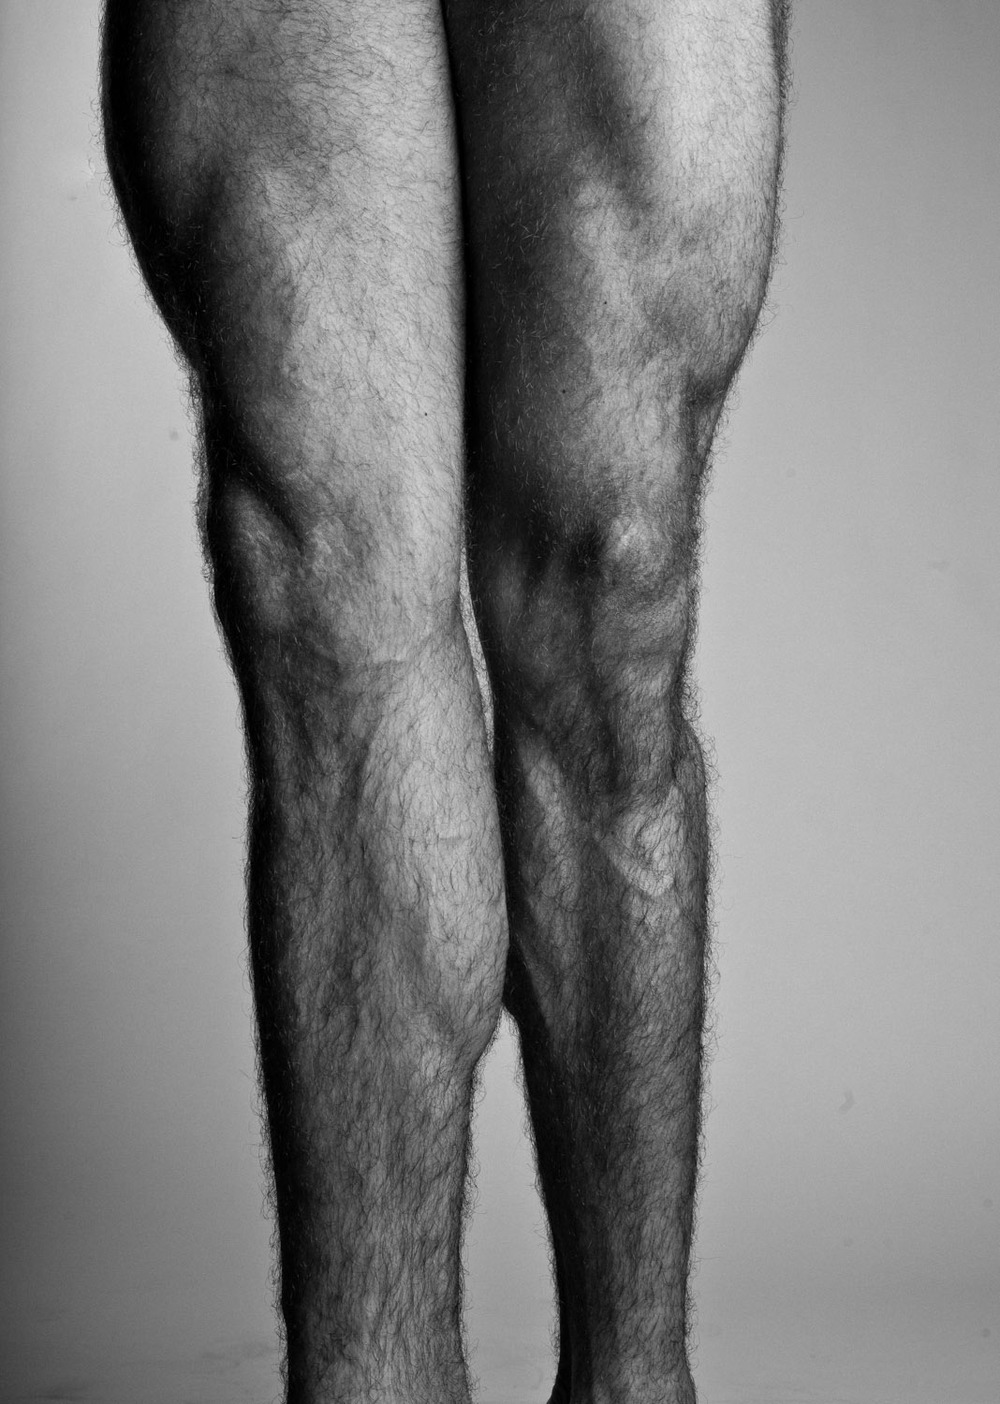 portrait legs